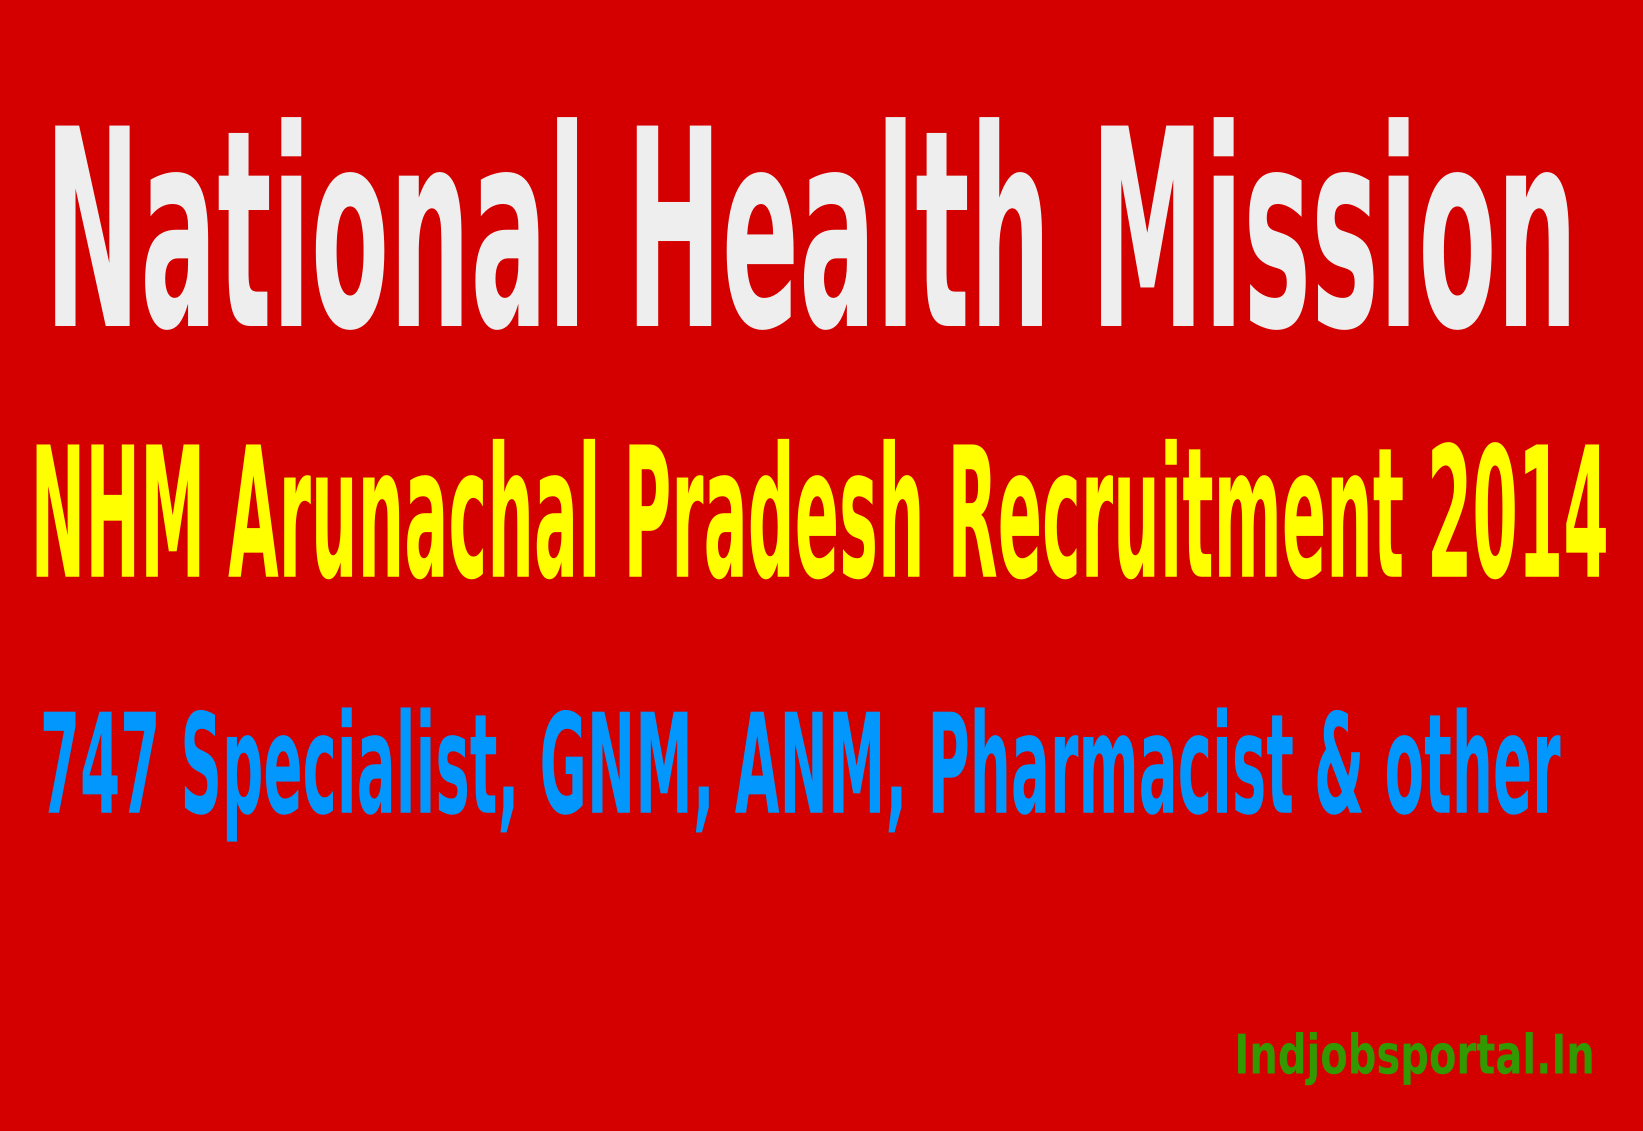 NHM Arunachal Pradesh Recruitment 2014 For 747 Specialist, GNM, ANM, Pharmacist & other Posts.